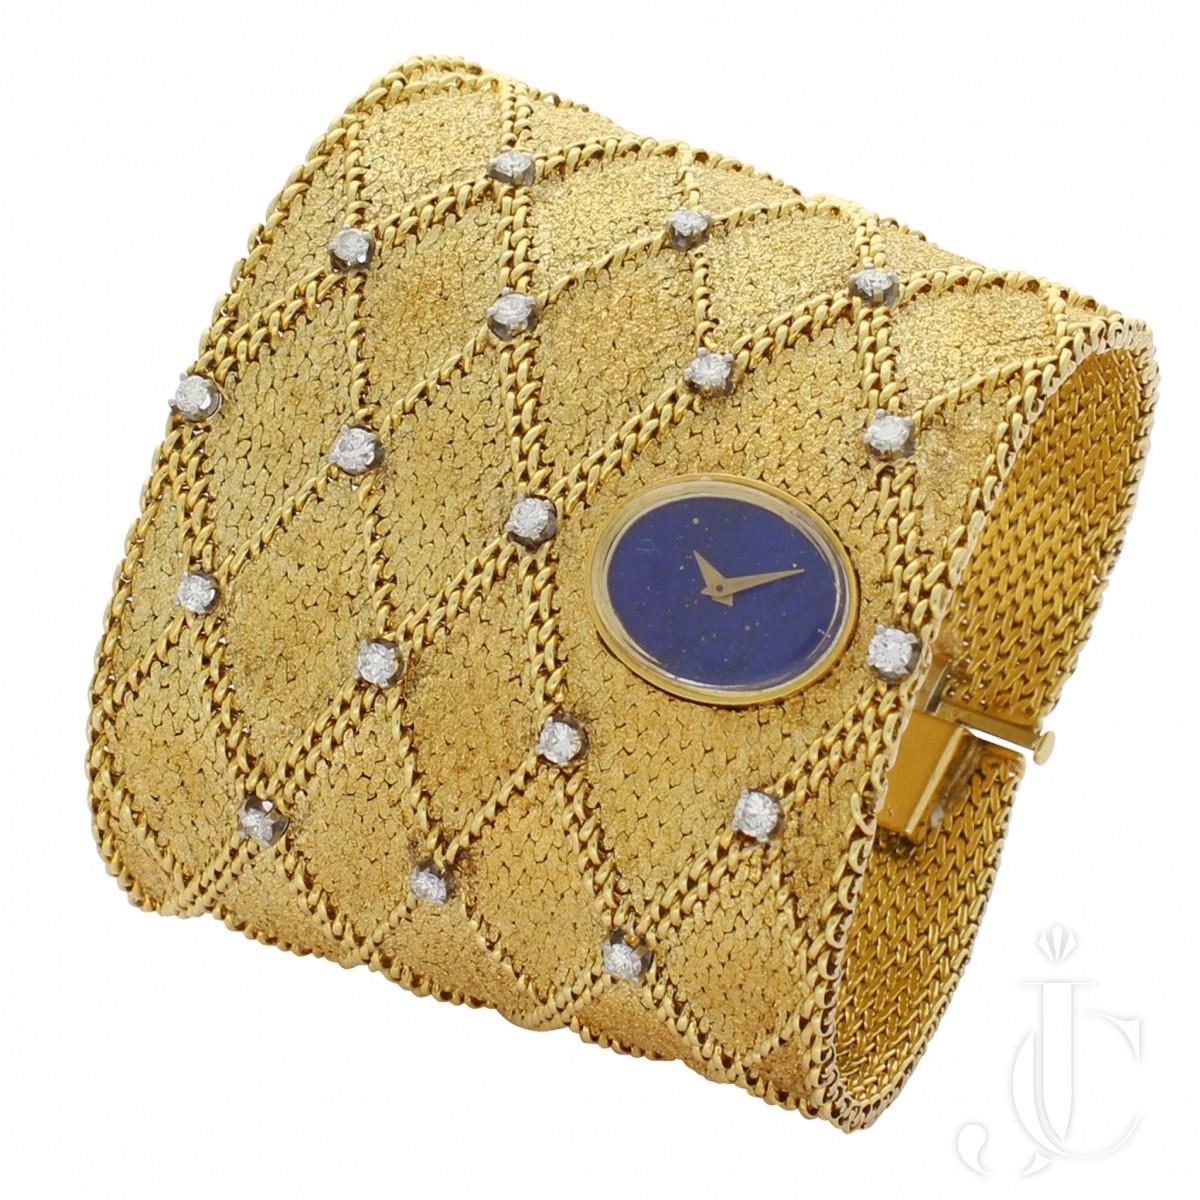 Ebel Woven Gold Cuff Watch